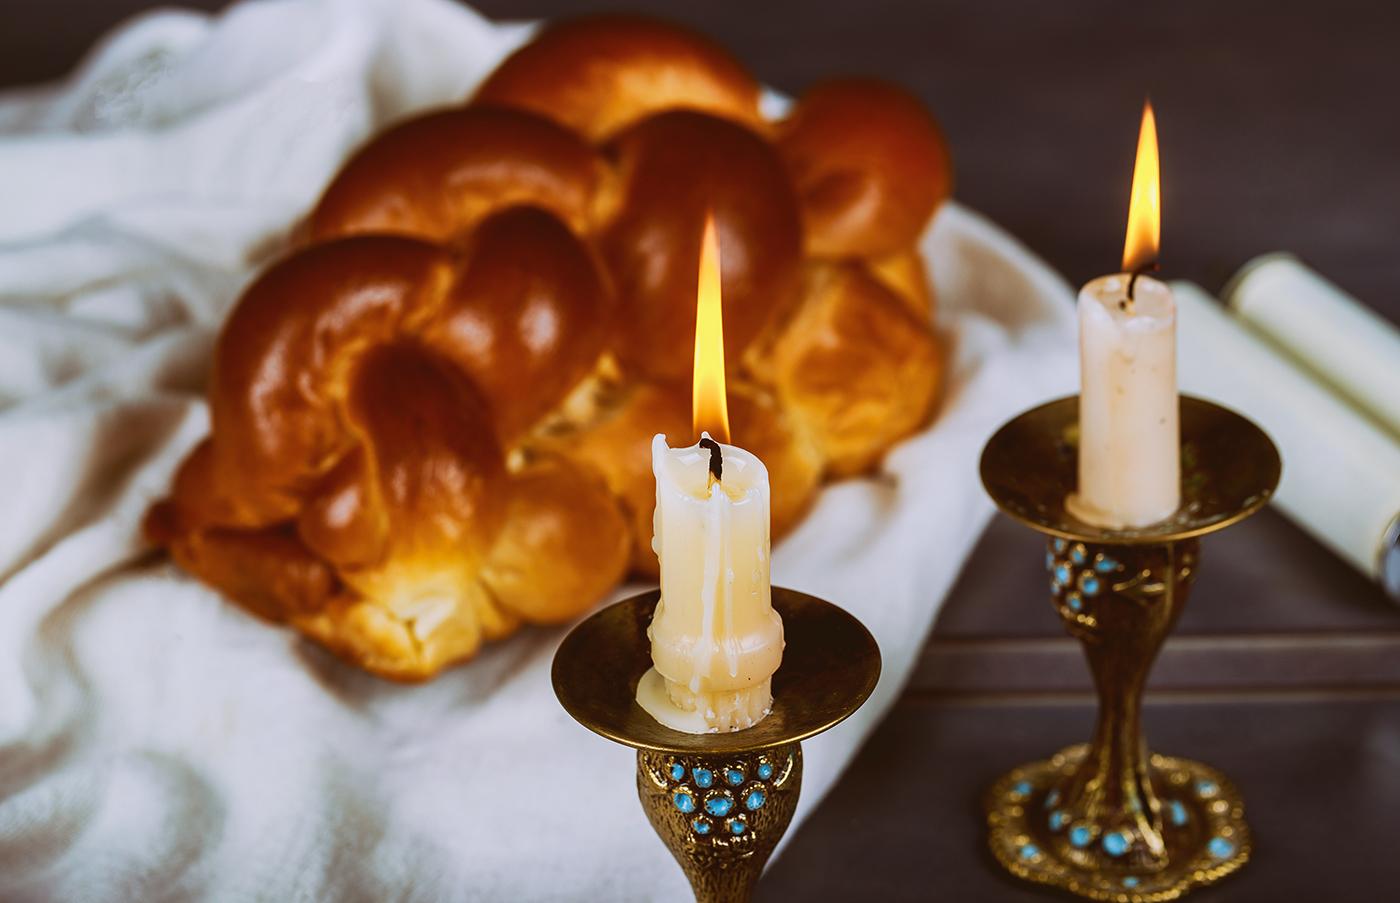 Traditional Jewish Homemade freshly baked challah for the Holy Sabbath ritual